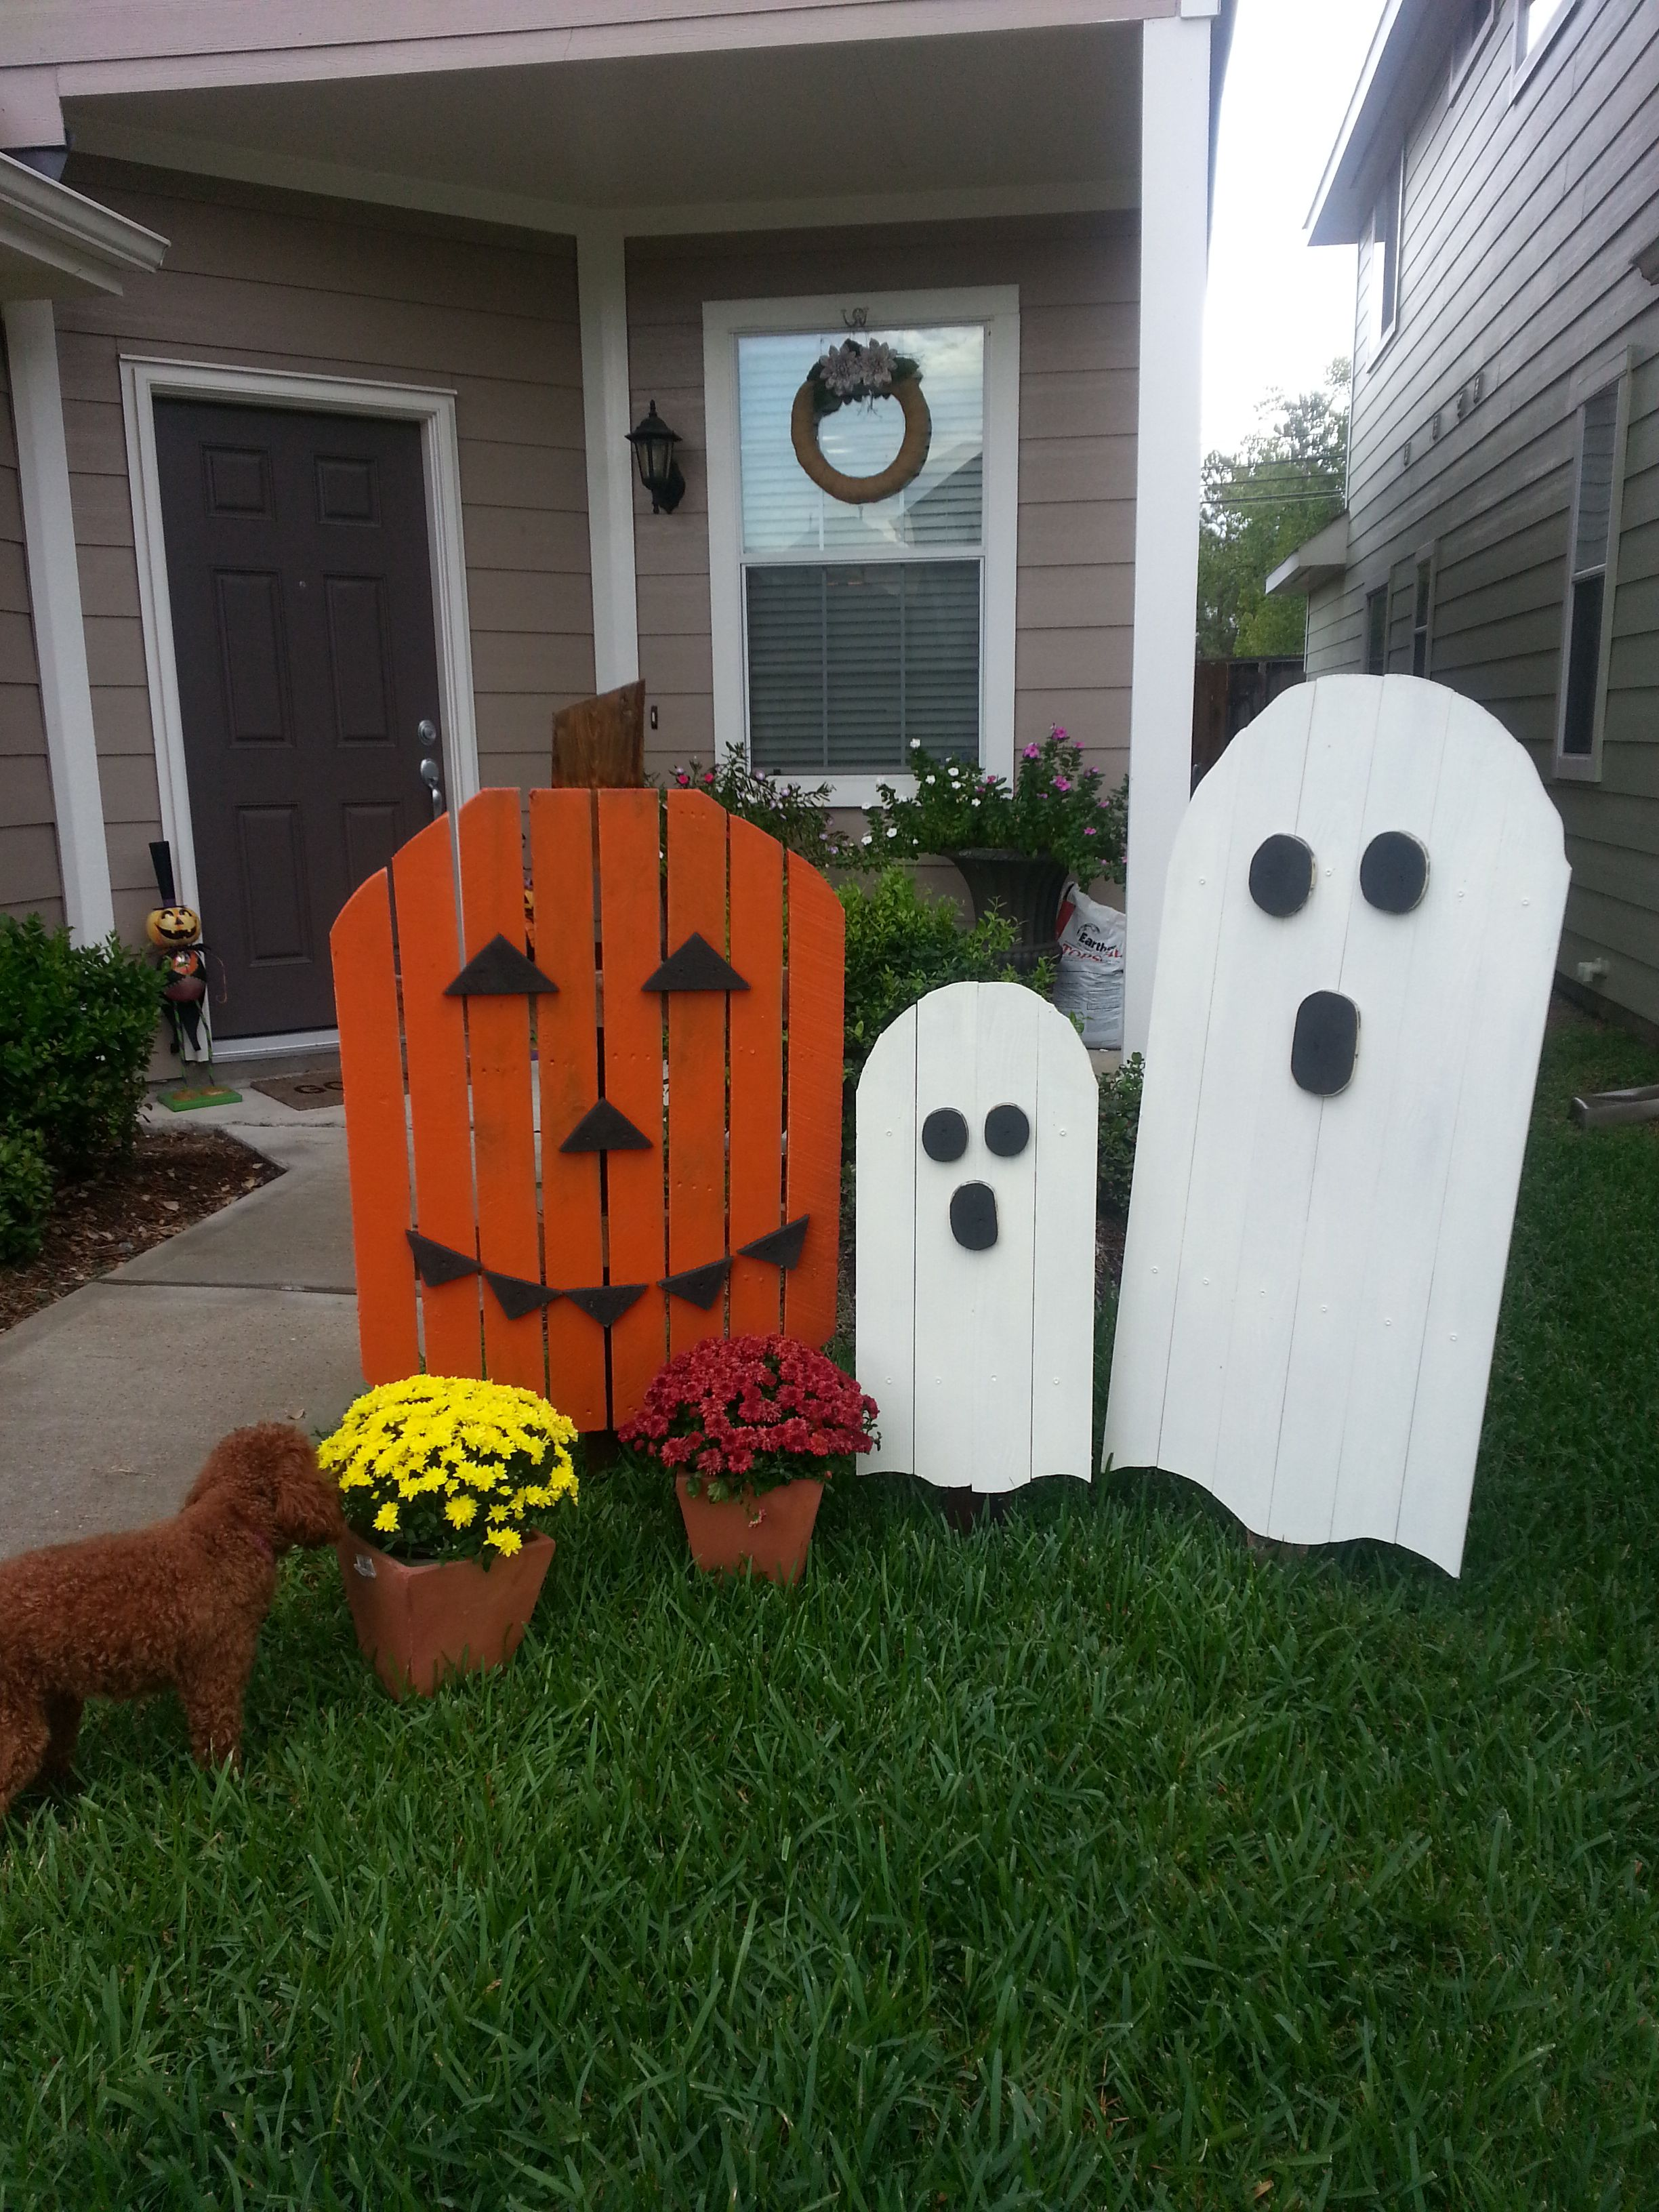 Wooden halloween yard decorations - 22 Superb Halloween Decorations Using Pallet Wood Pallet Ideas